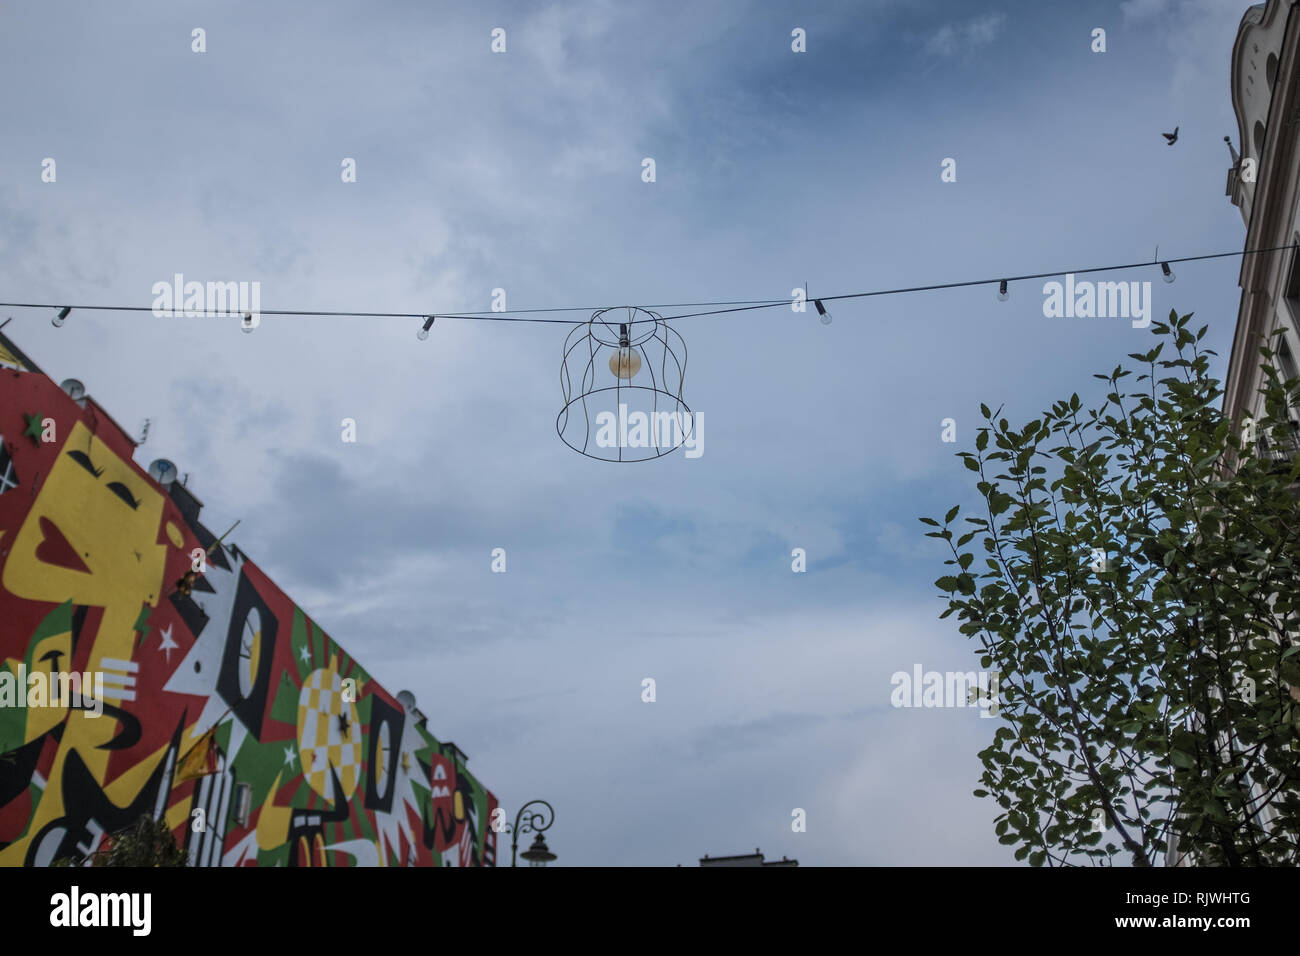 festive lighting across a street with a graffiti wall Stock Photo